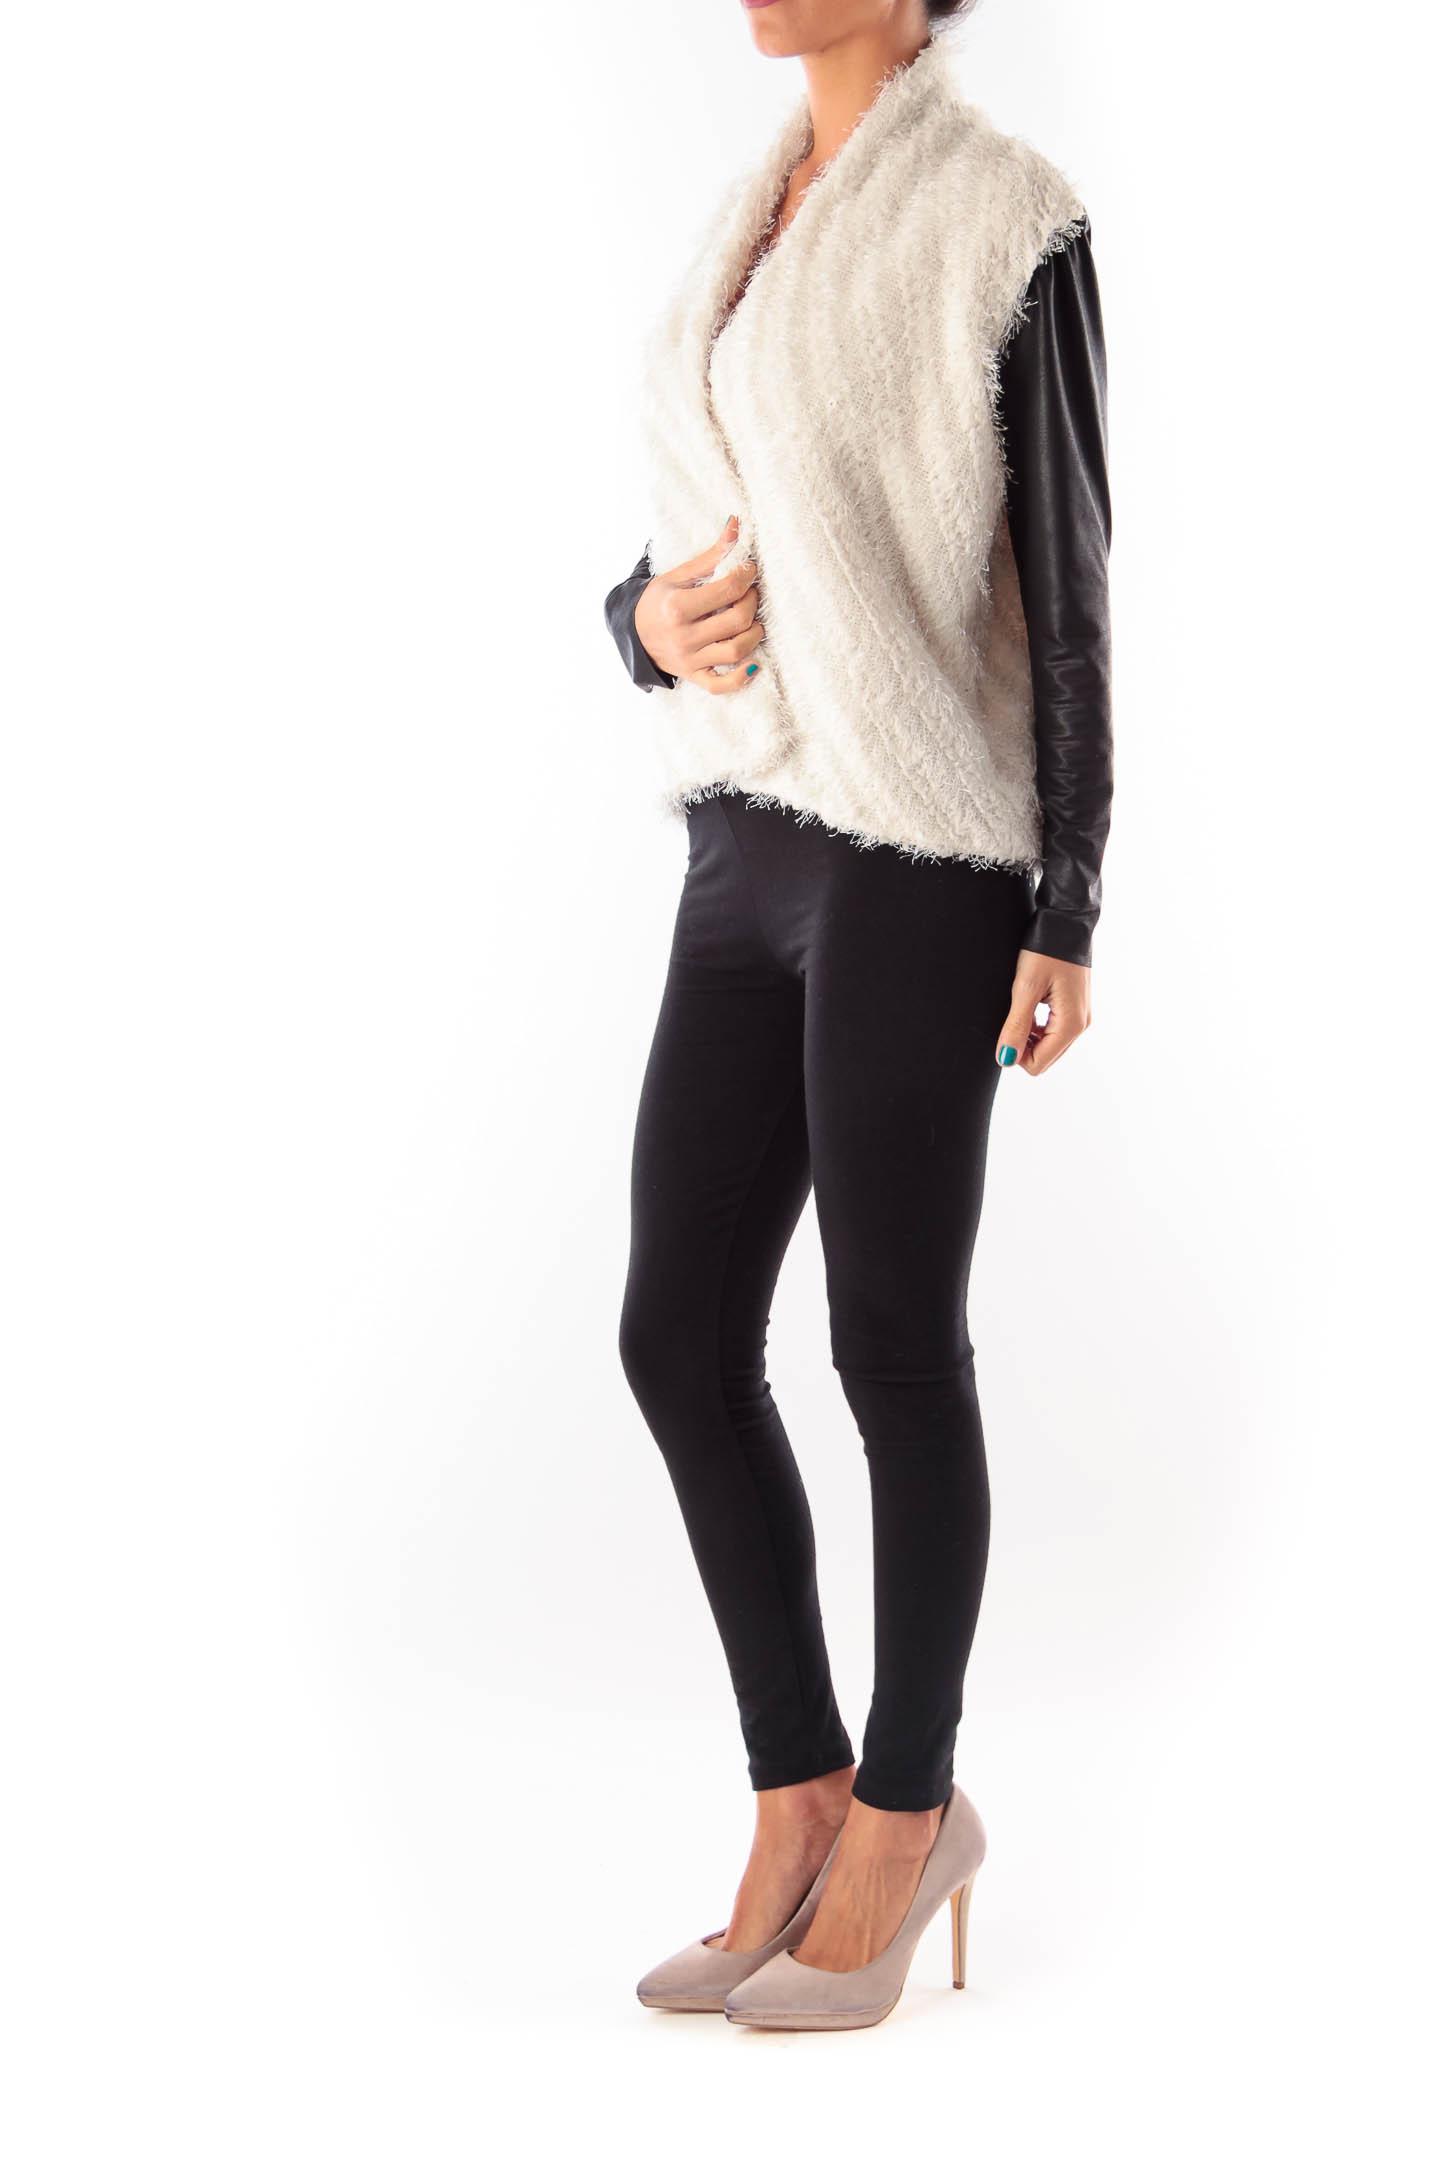 Beige & Black Sleeve Coat